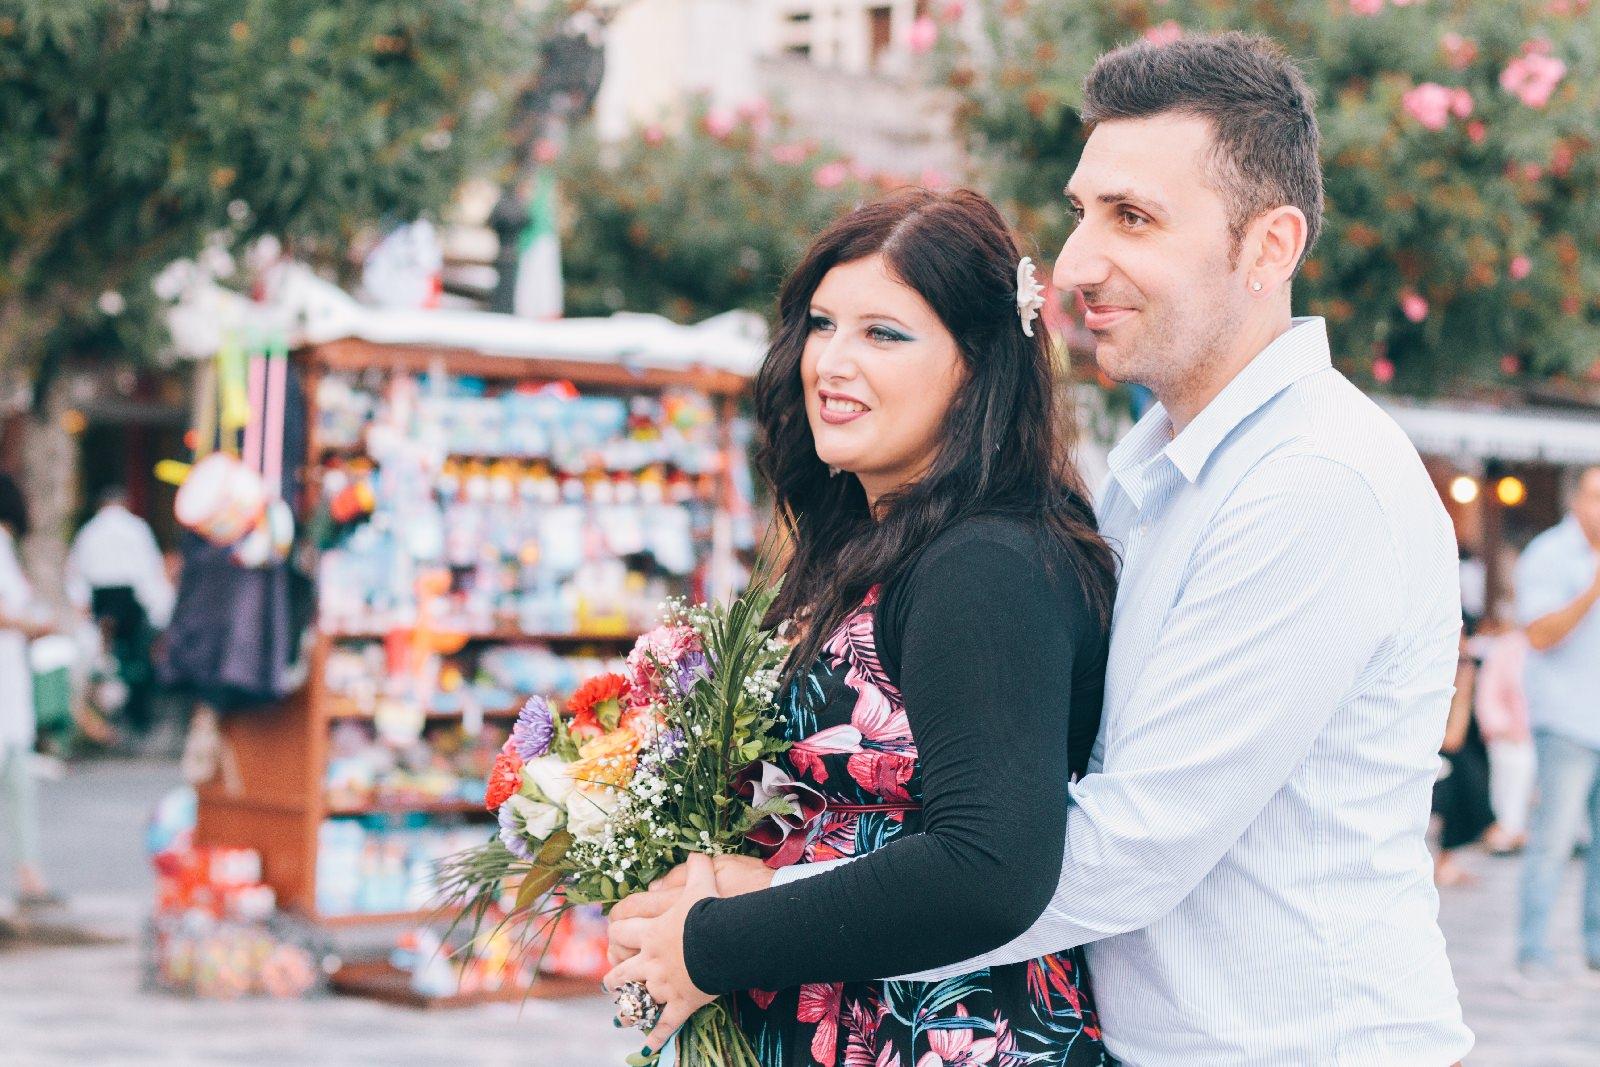 065-2018-09-22-Engagement-Alessandra-e-Igor-Pizzone-065